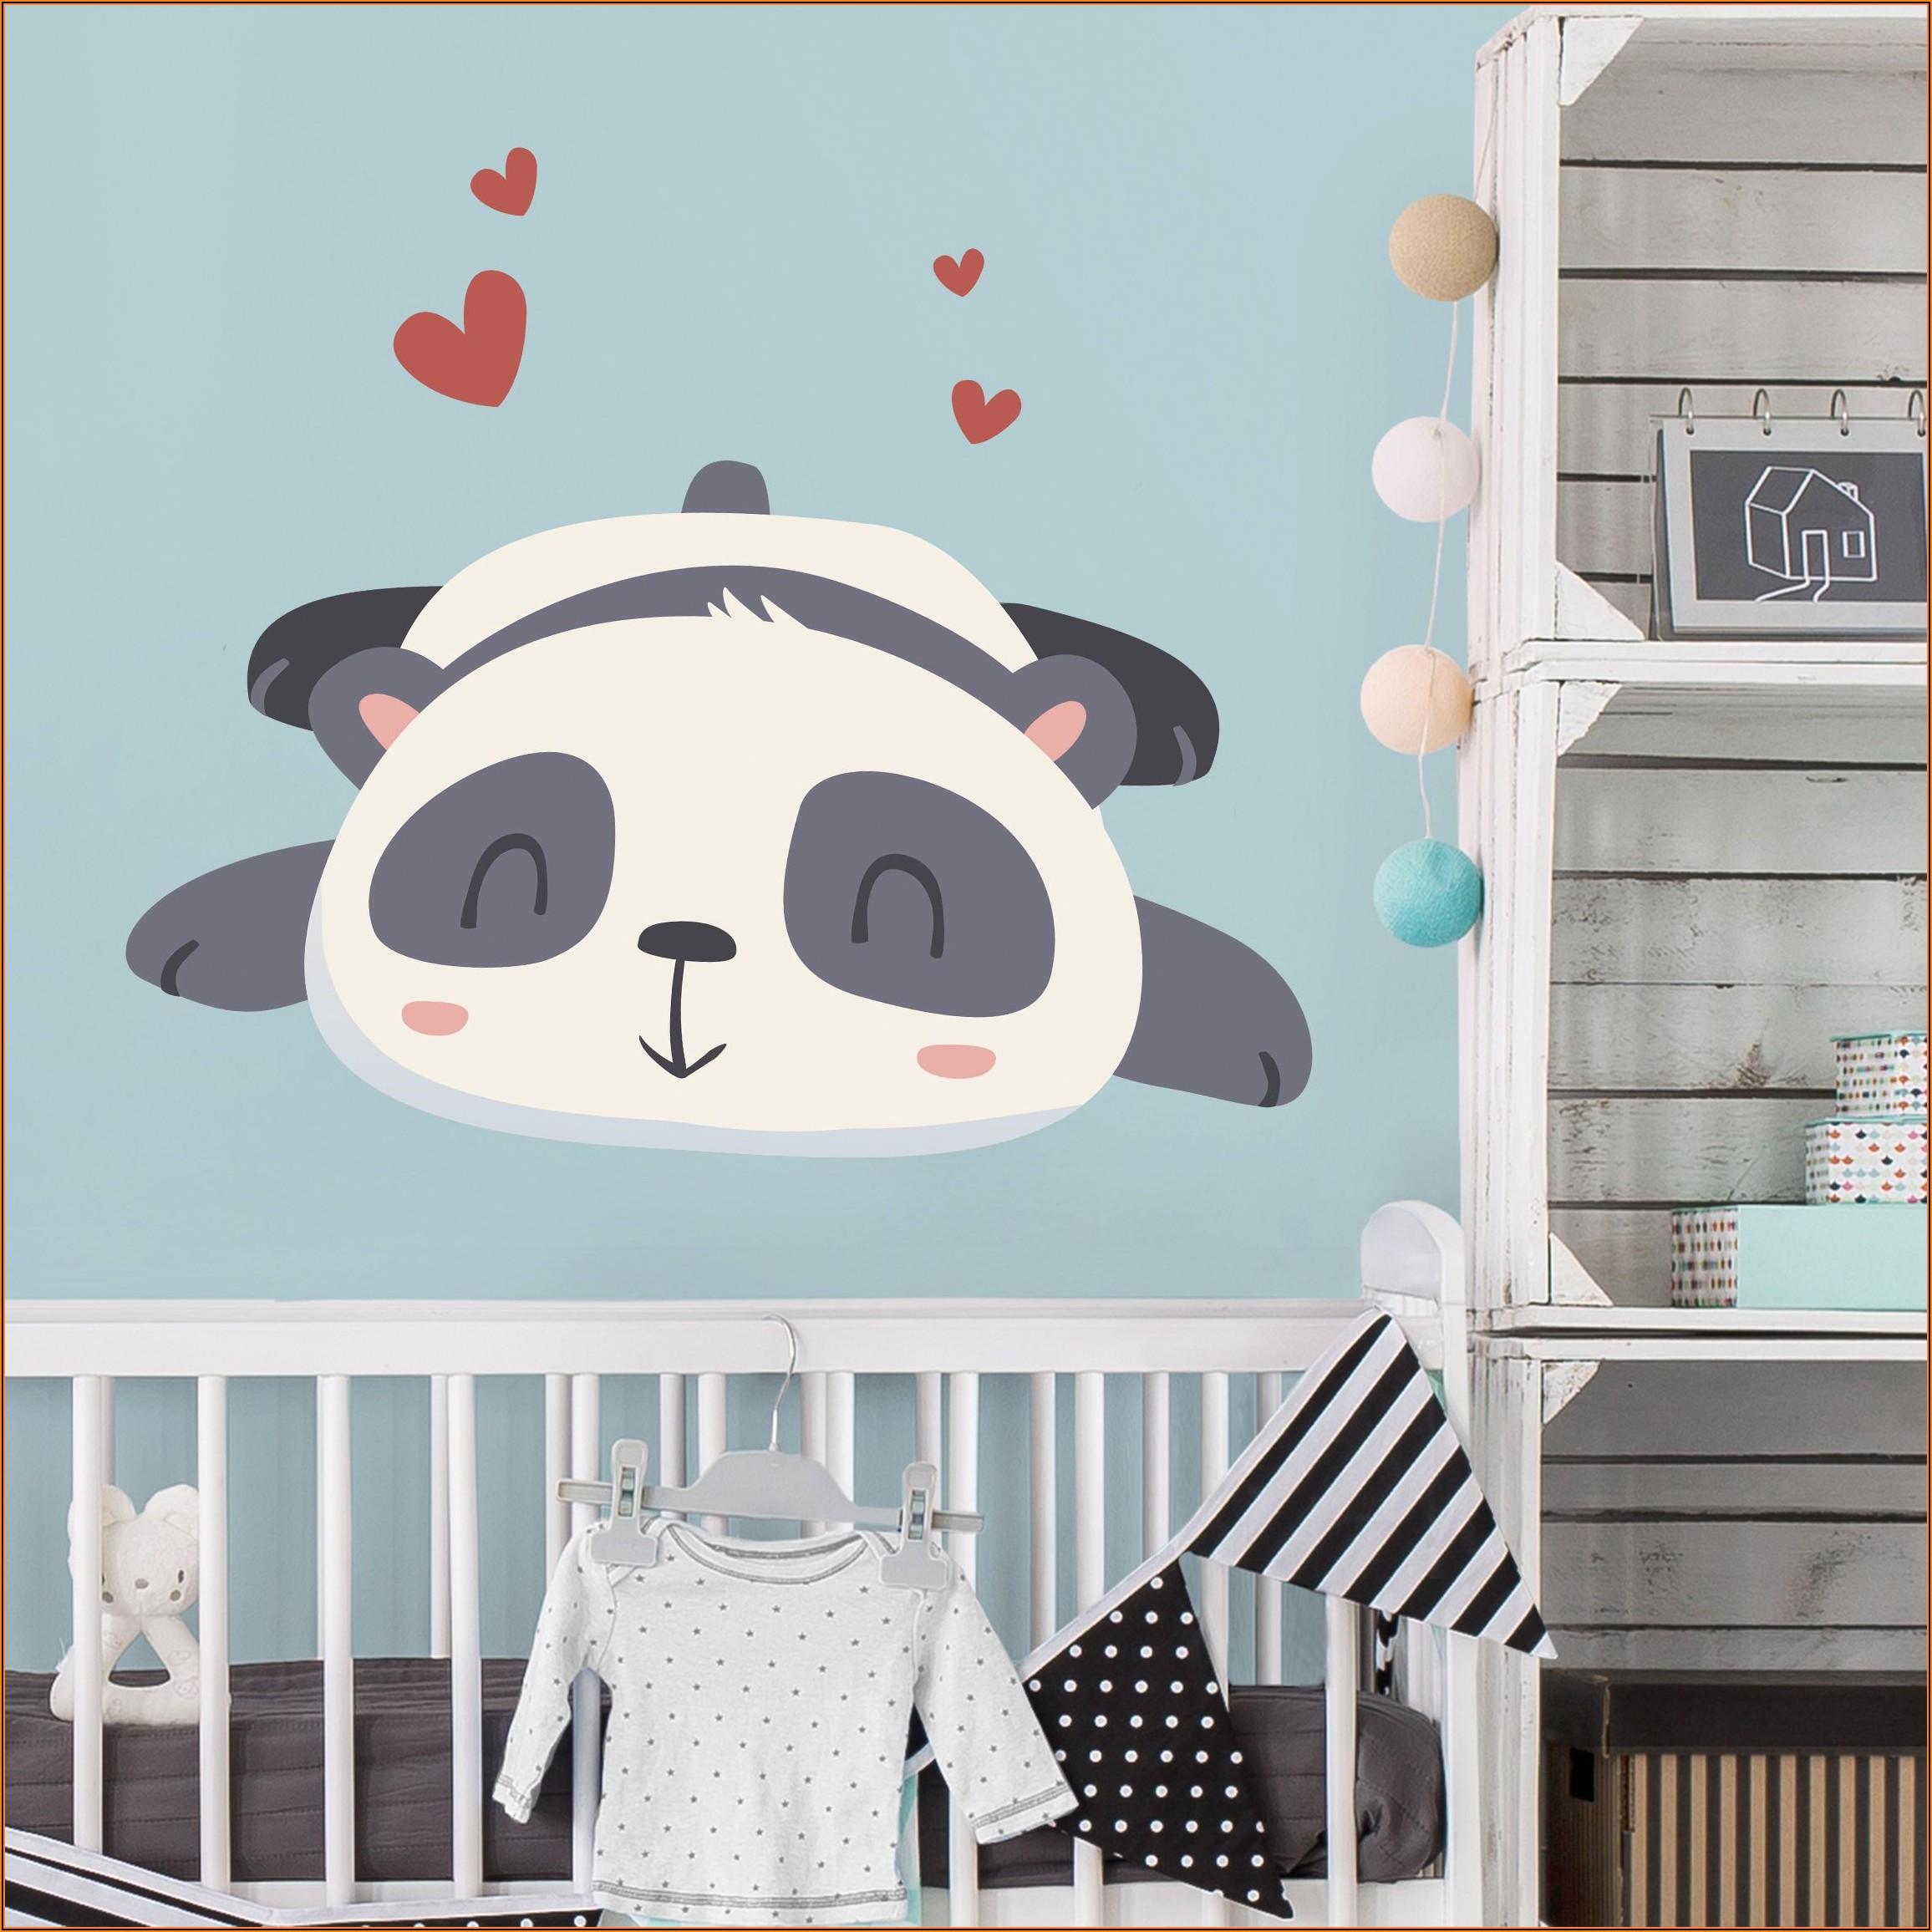 Wandtattoo Kinderzimmer Panda